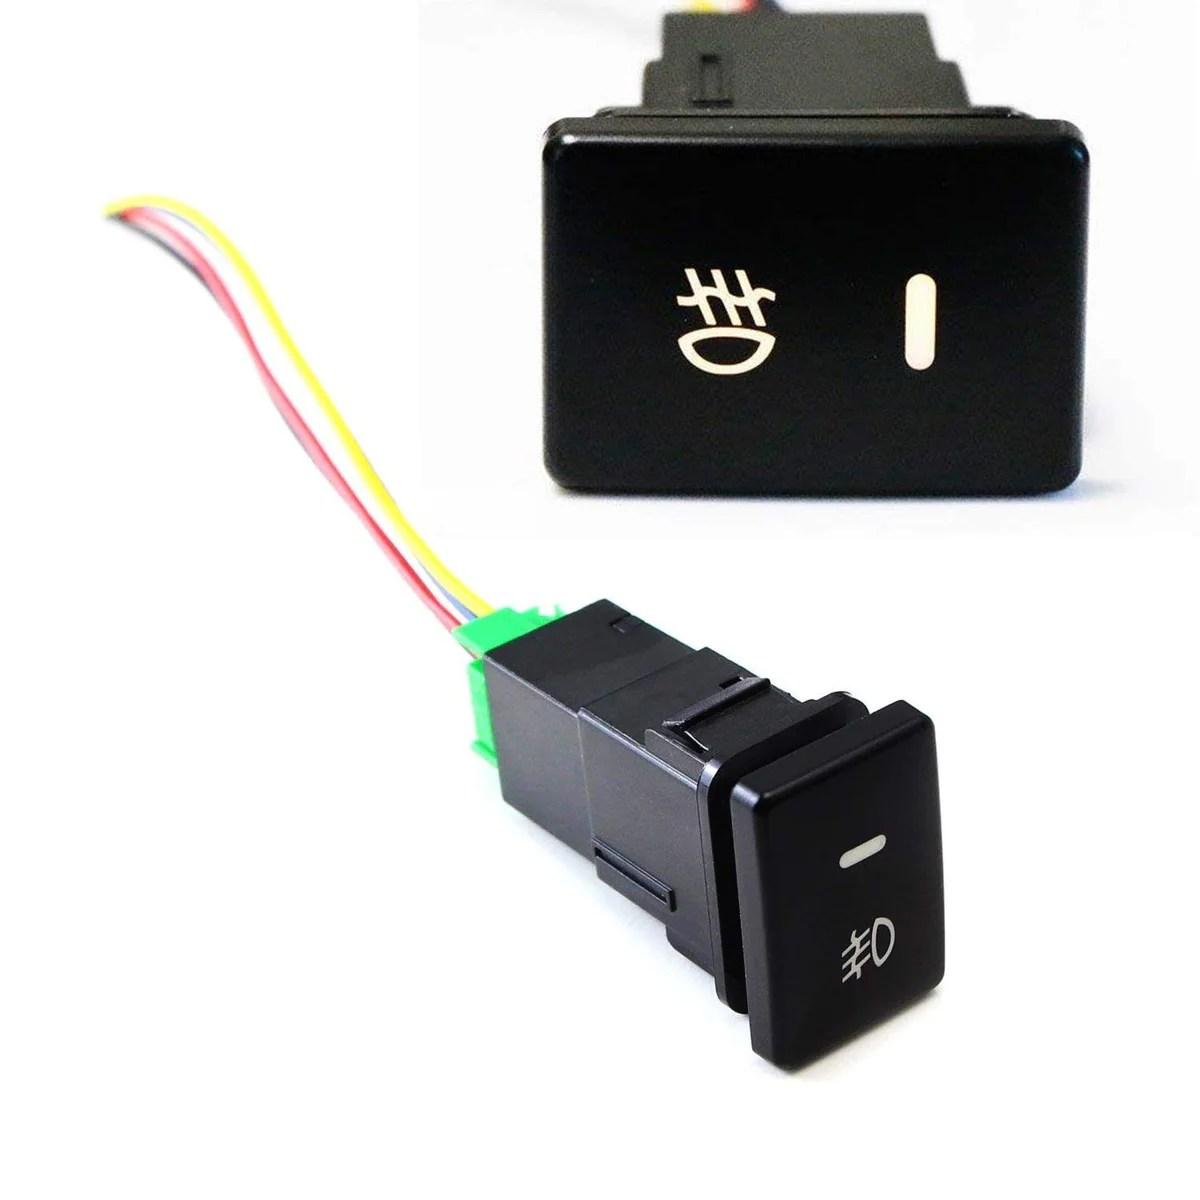 small resolution of  rav aftermarket fog light wiring diagram on aftermarket cigarette lighter diagram hella headlight wiring diagram